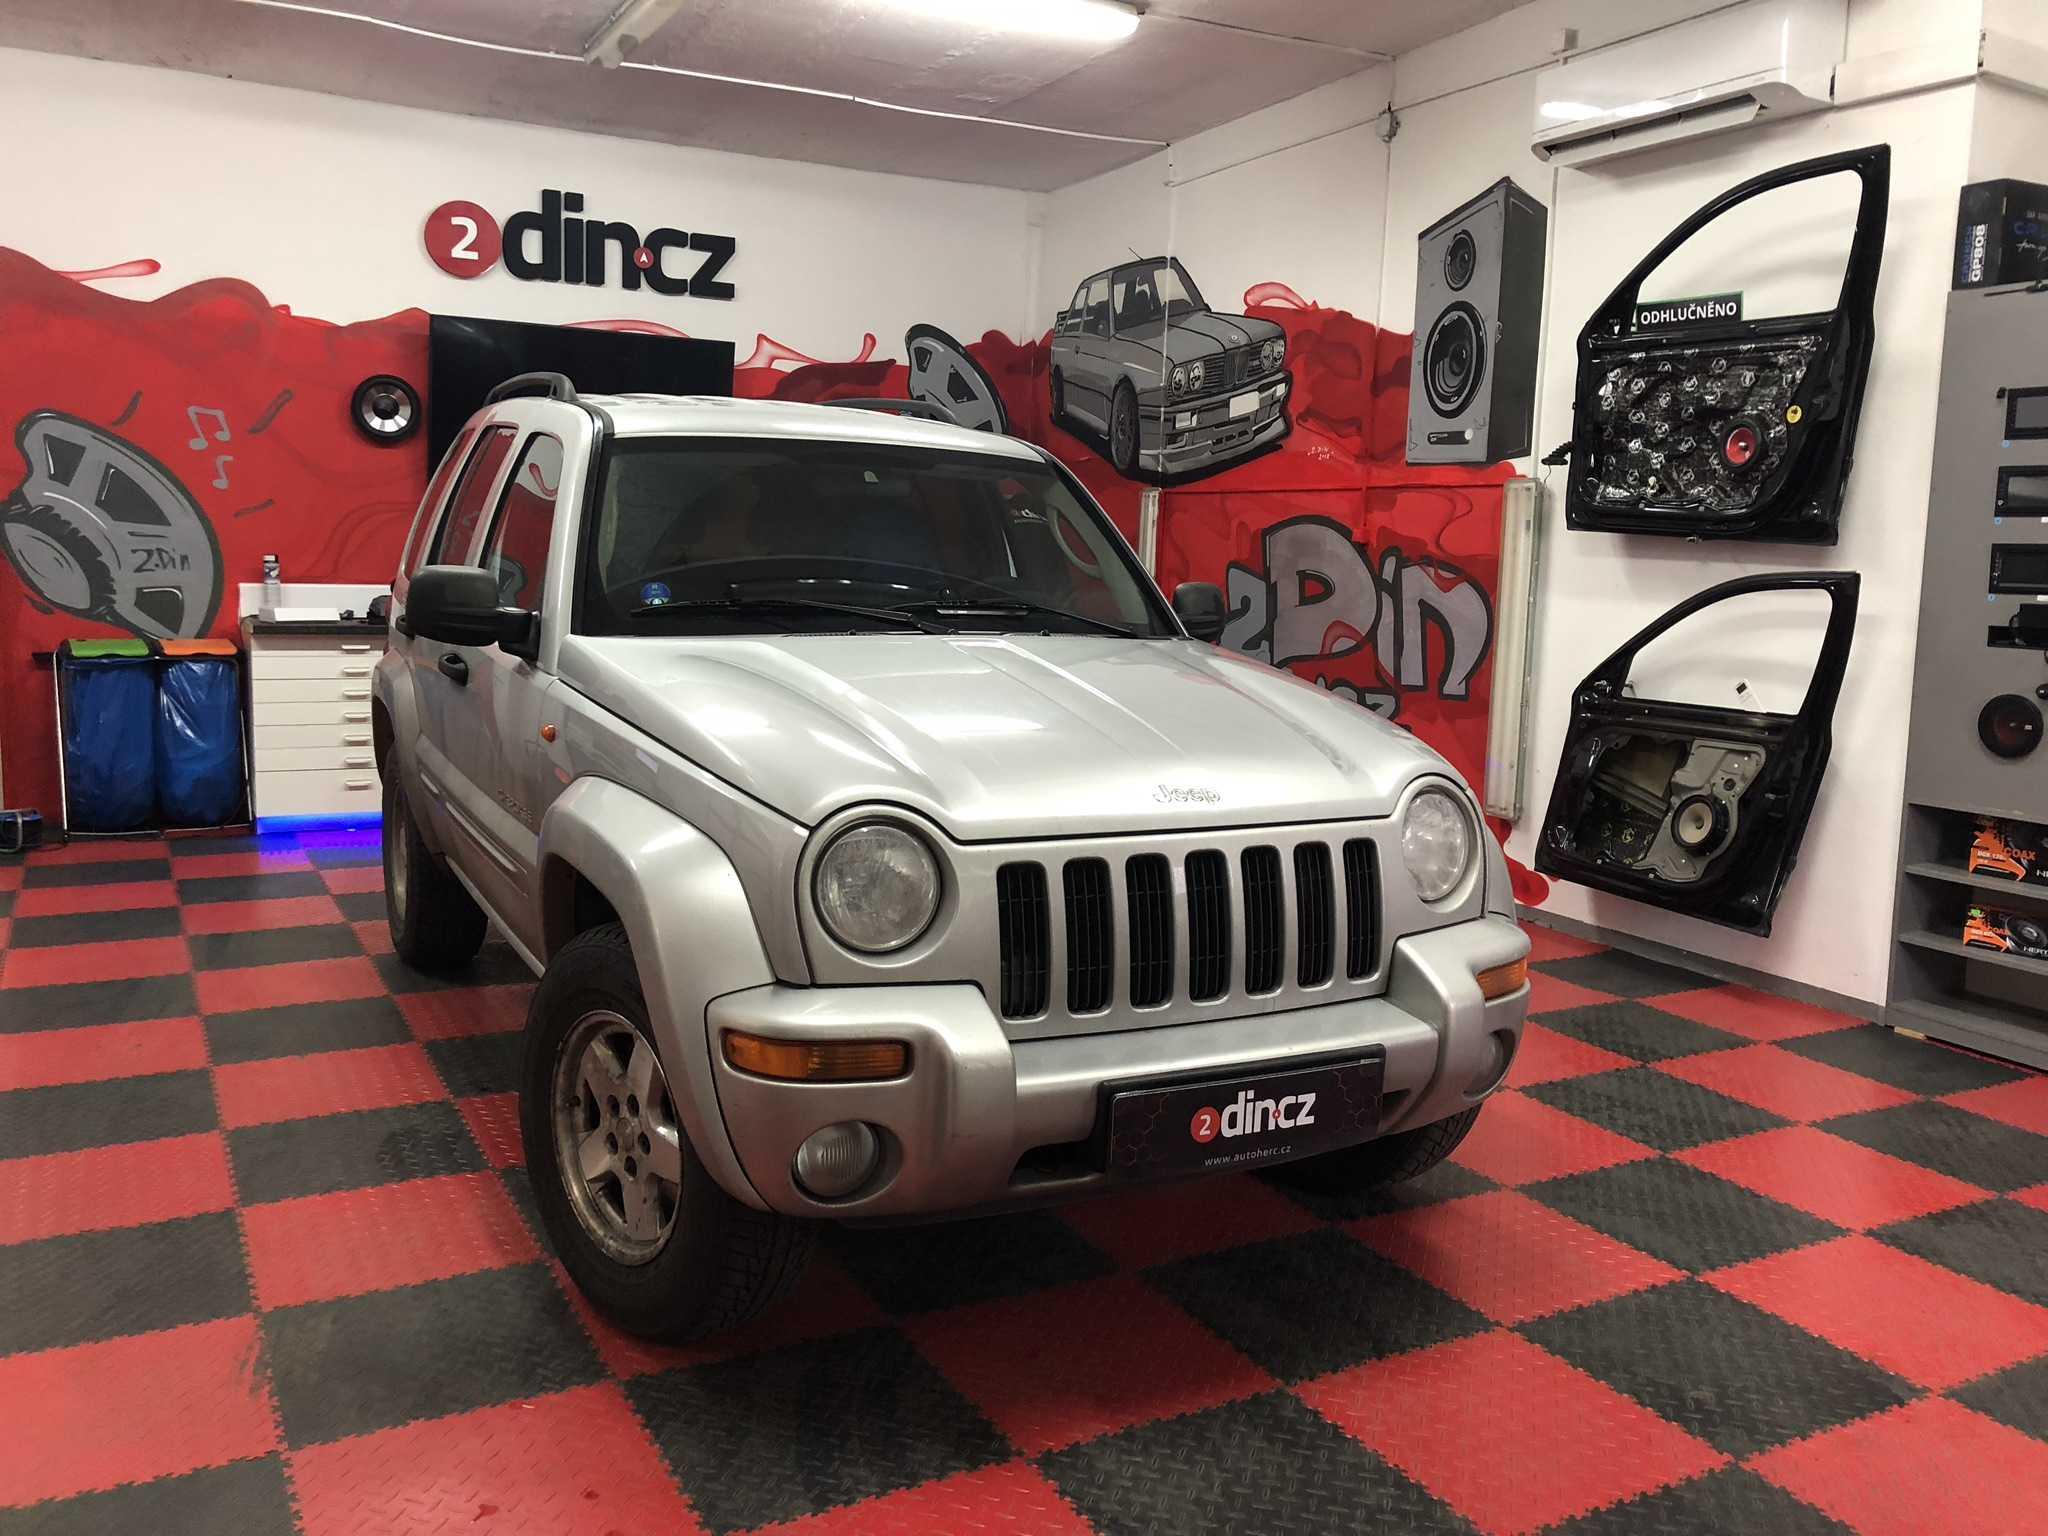 Jeep Cherokee - Montáž 1din rádia